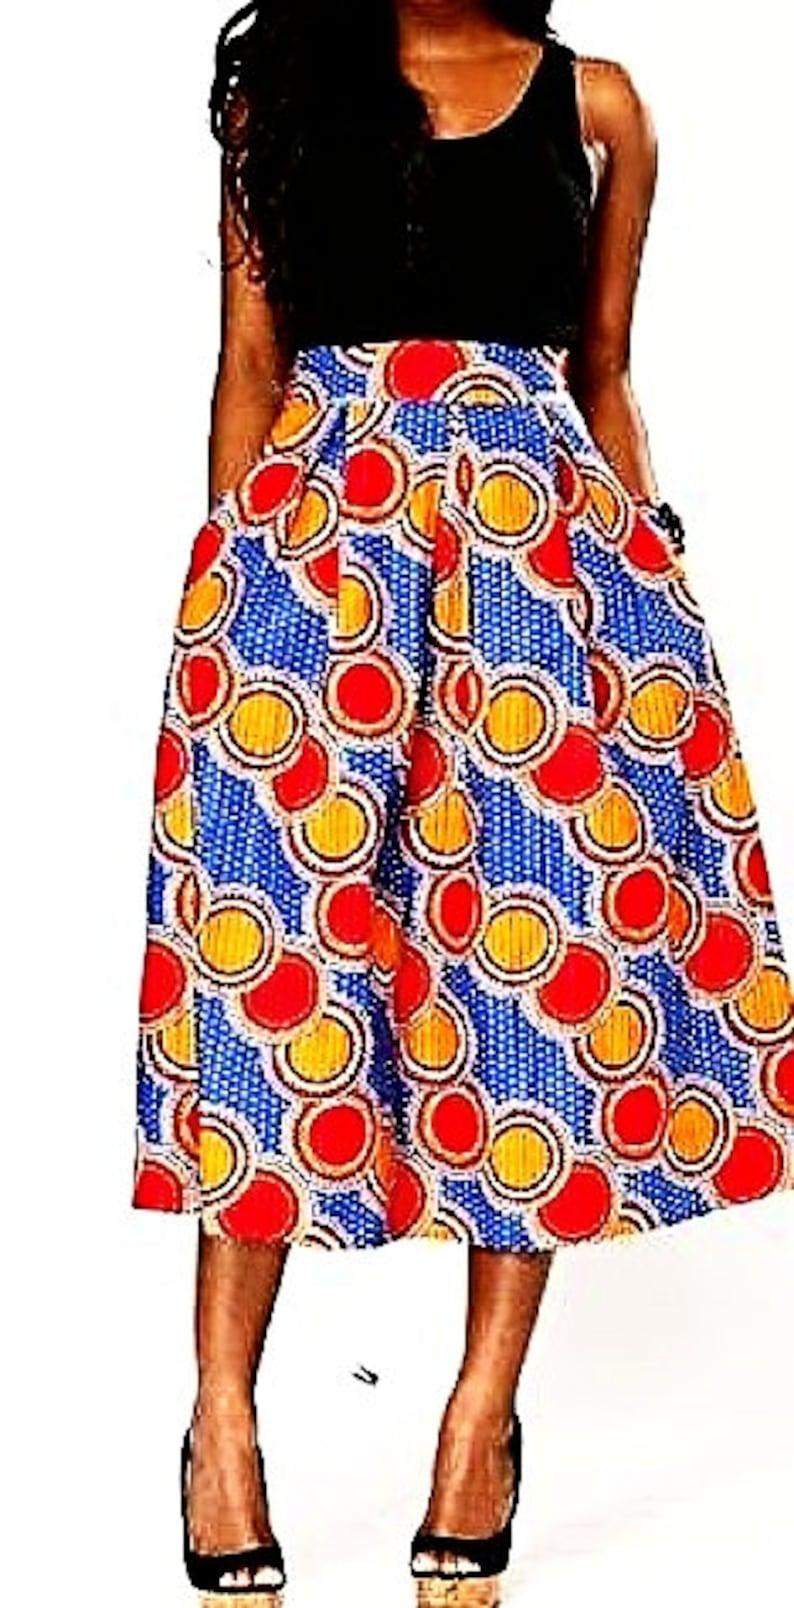 African Fabric  Ankara Fabric  Wax print fabric  African cloth  6 yards 45 in Red Blue wide